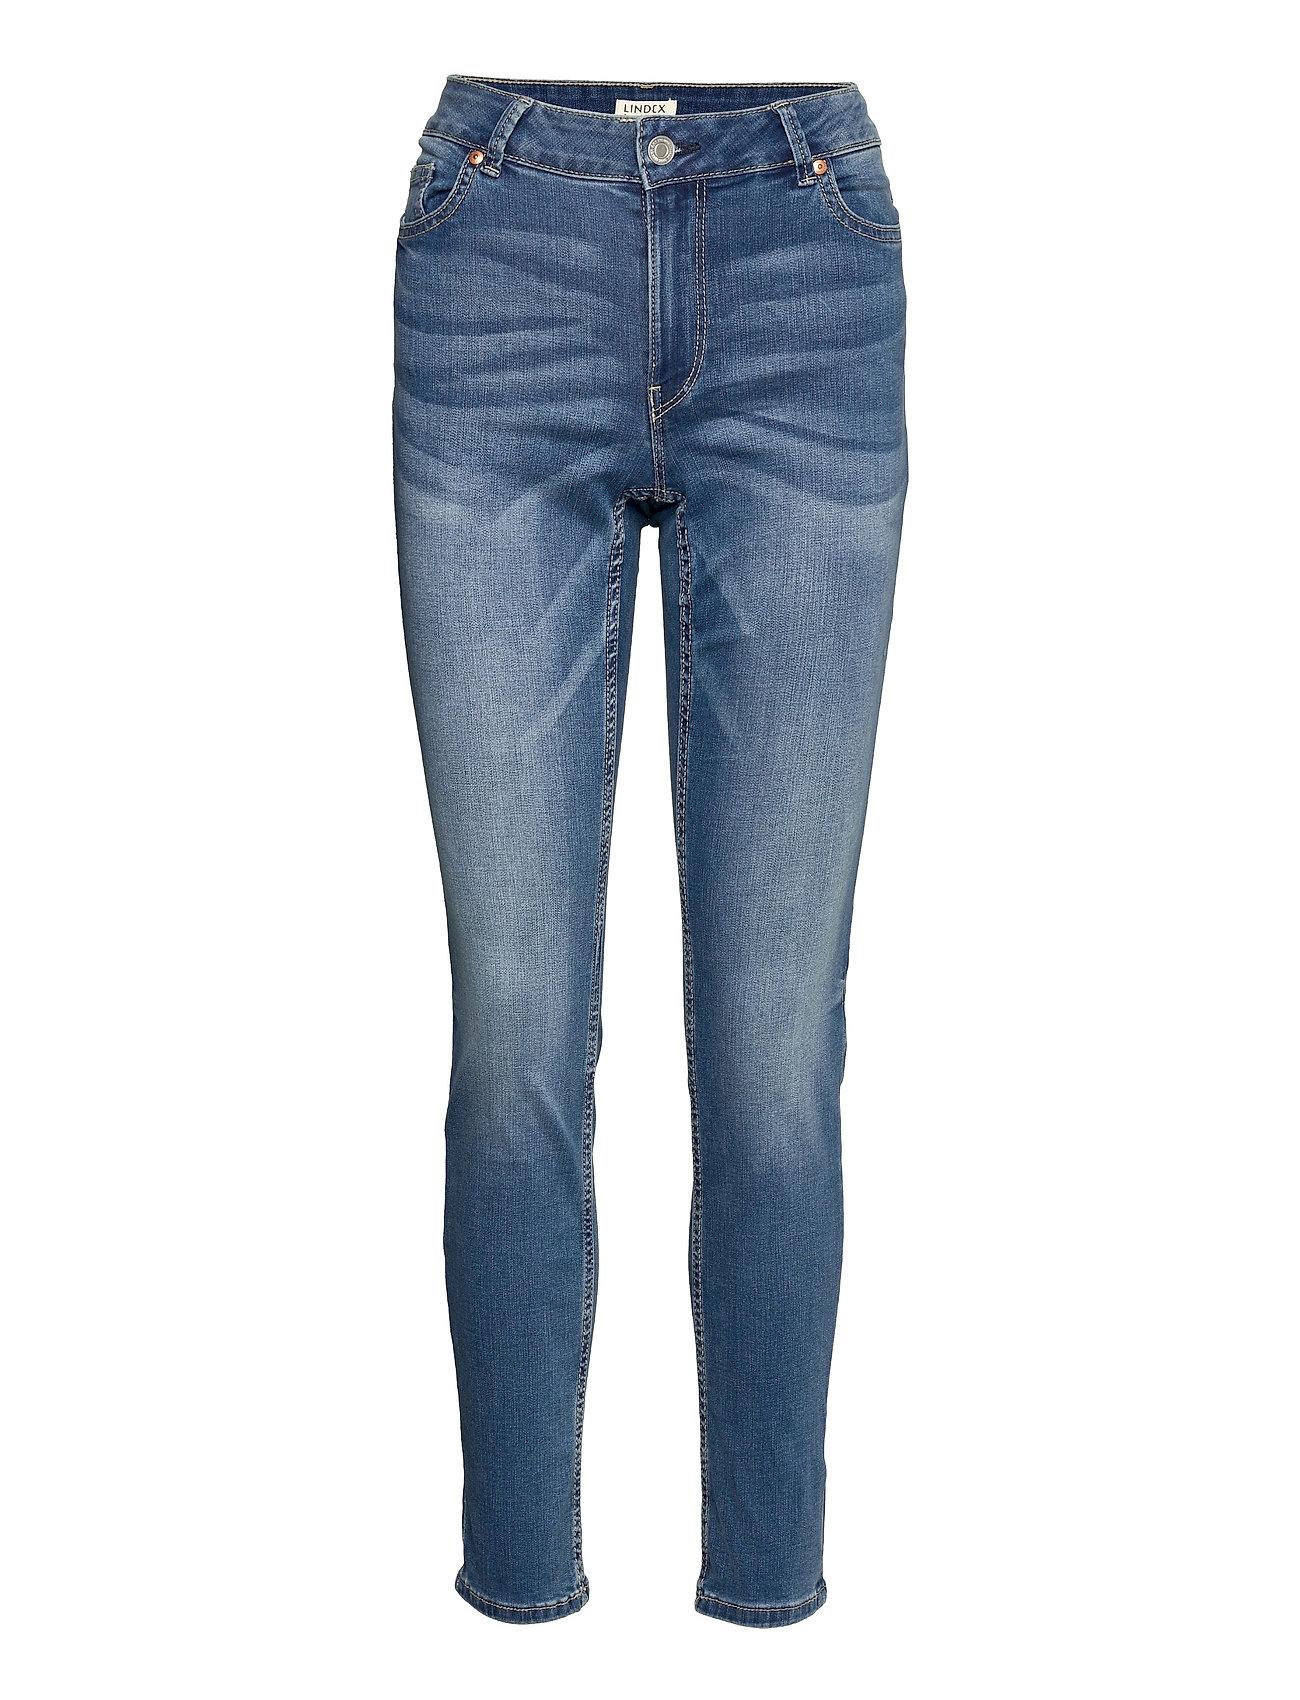 Trousers Denim Tova Soft Blue Slim Jeans Blå Lindex